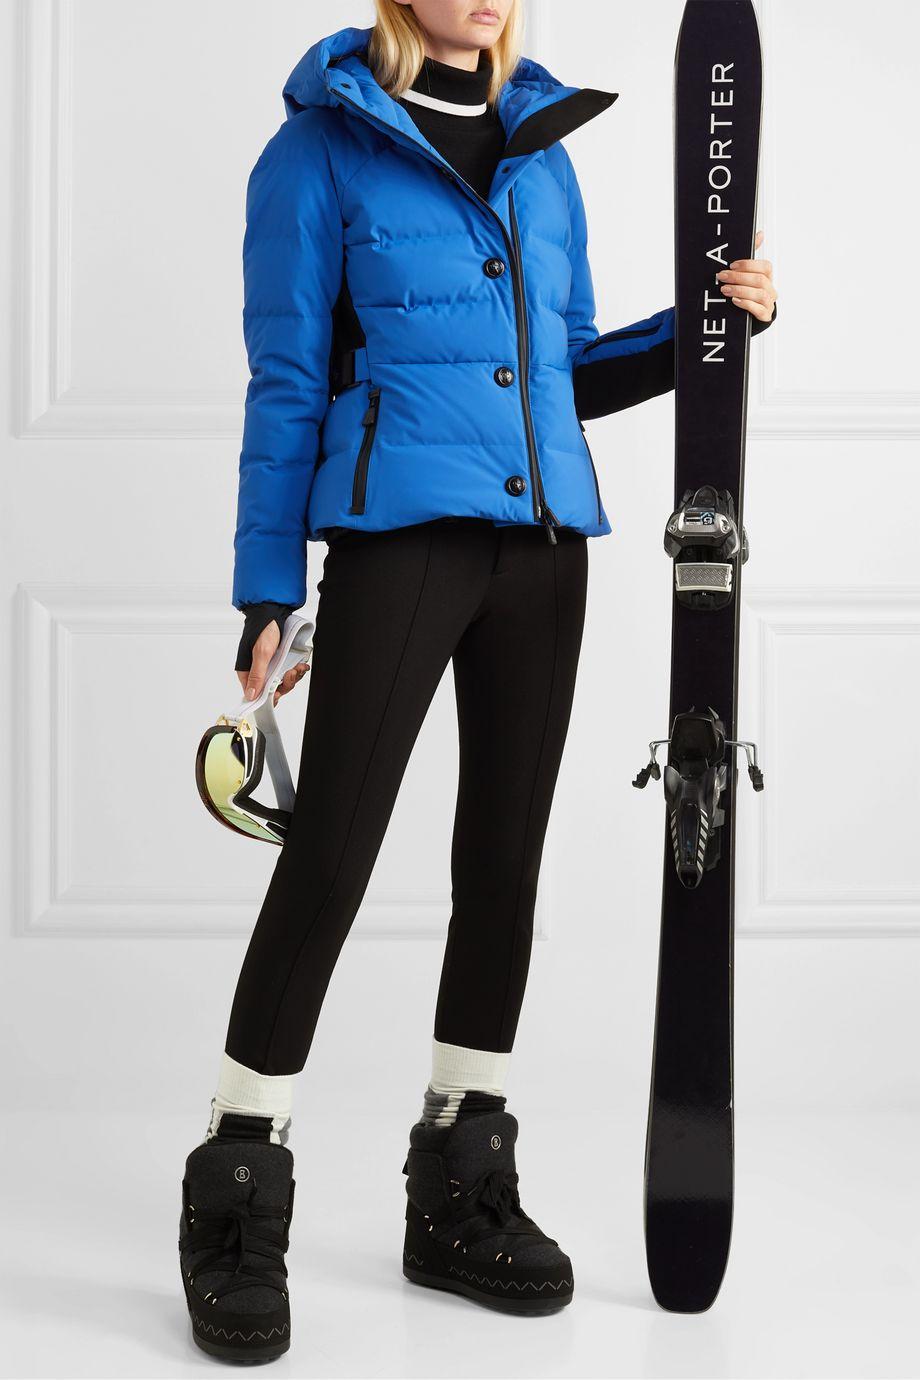 FALKE Ergonomic Sport System SK2 intarsia wool-blend ski socks